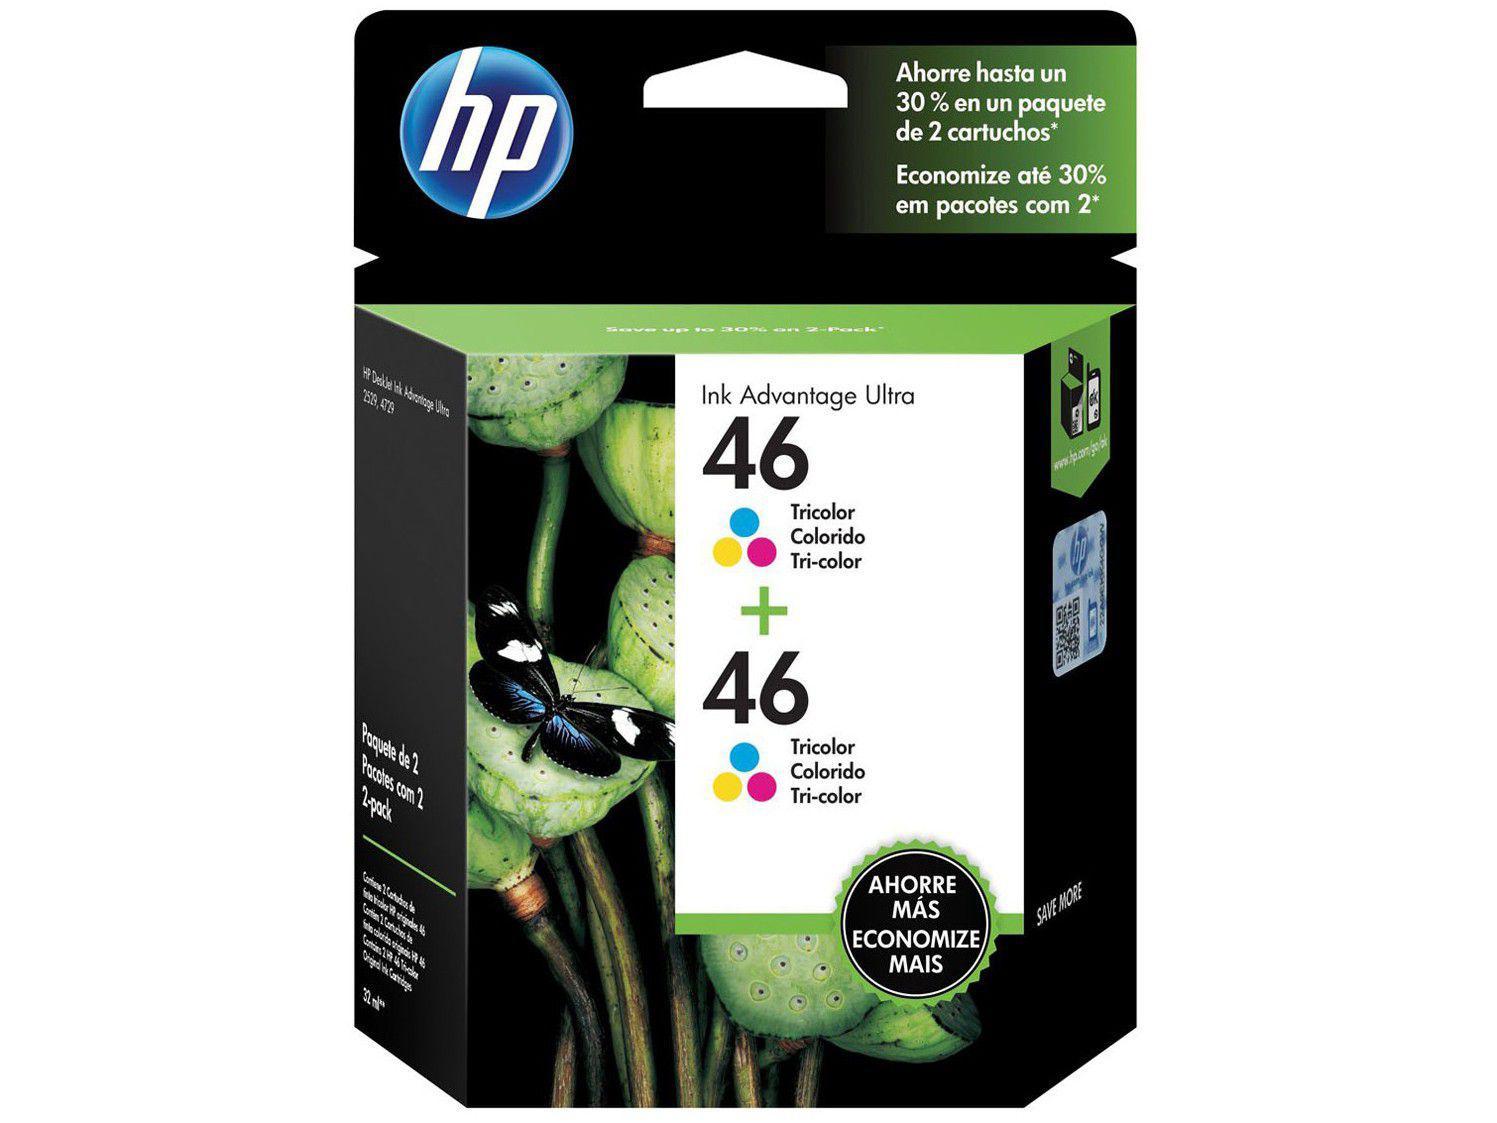 Cartucho de Tinta HP Colorido 46 Original P/ - HP 2529 2029 2020 2520 4729 5738